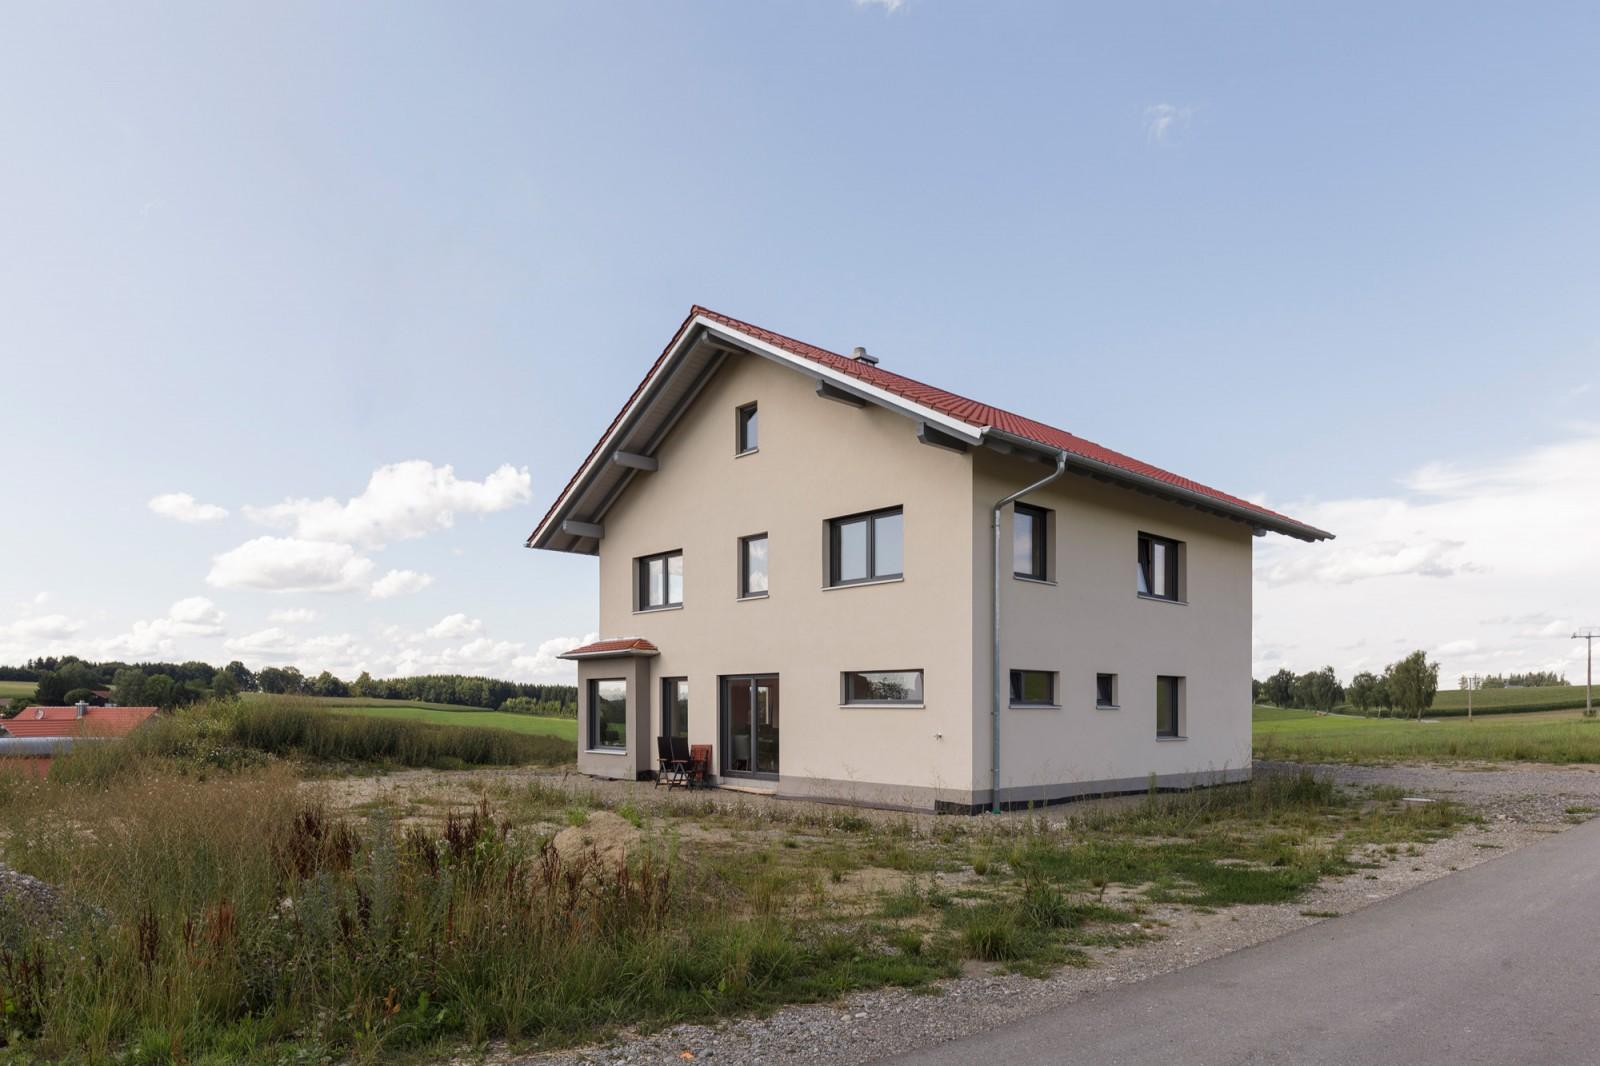 Holzhaus aus MHM